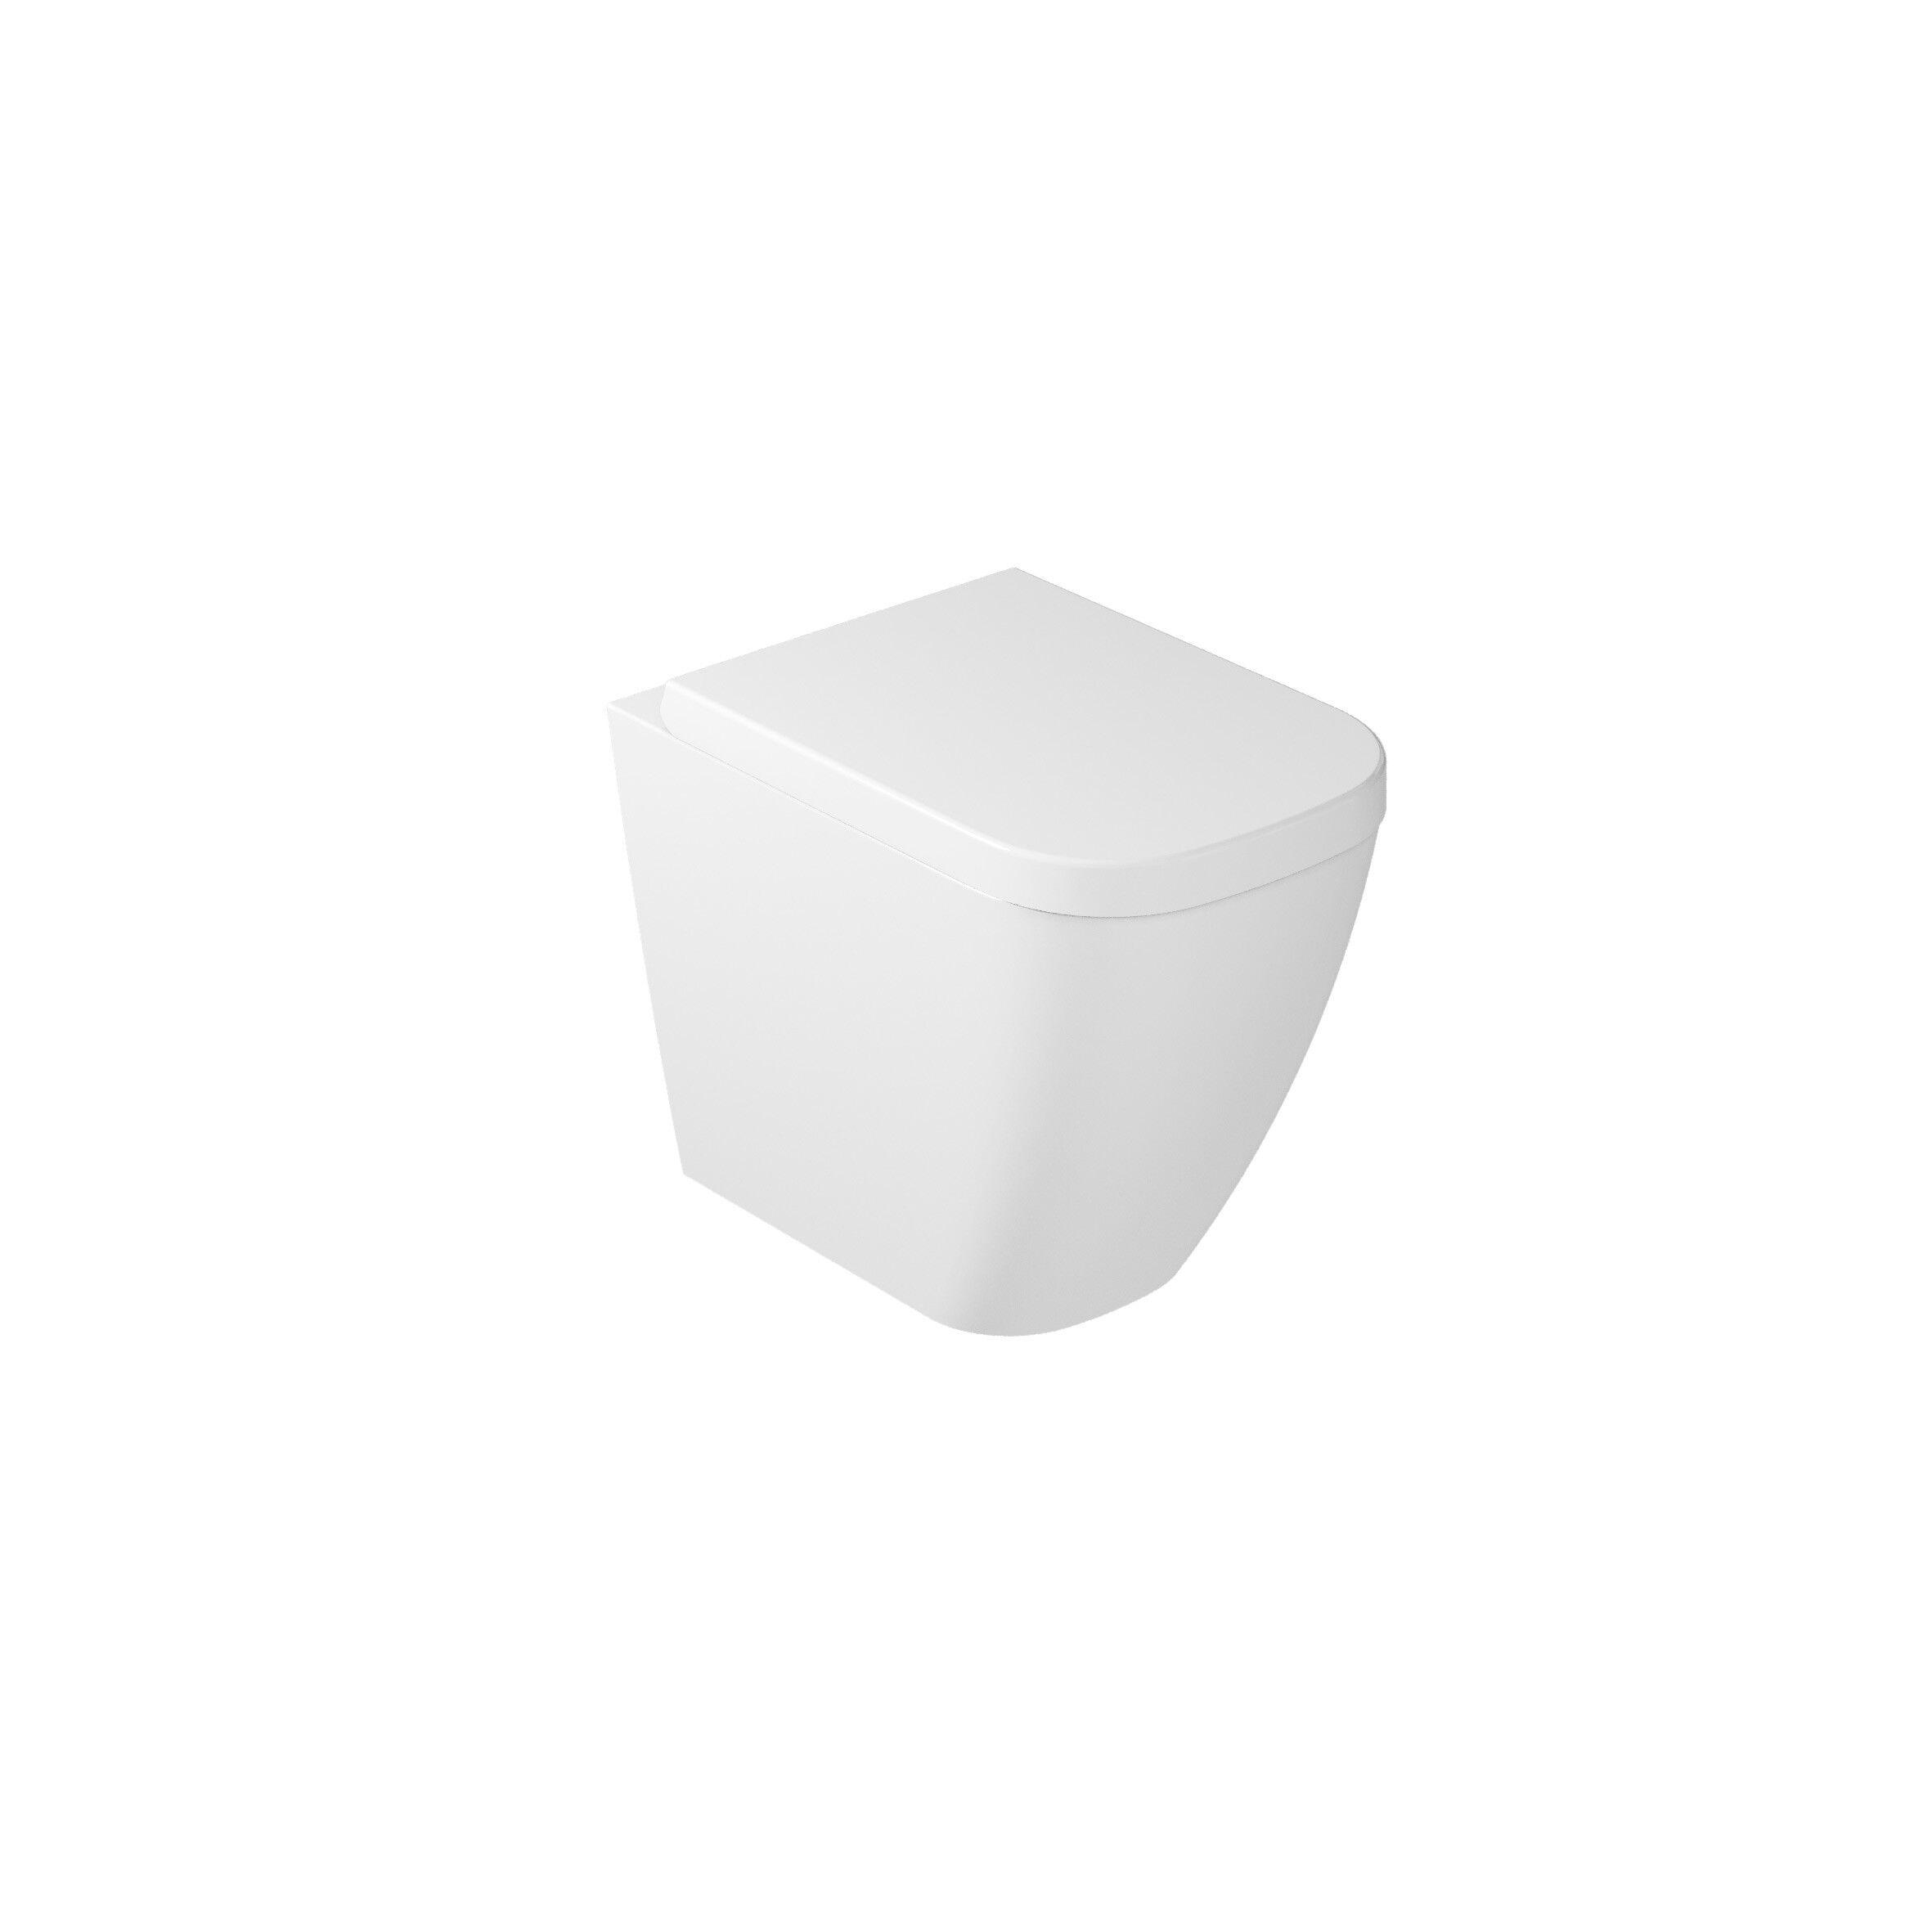 CAESAROO Vase sur pied en céramique blanche brillante Galassia série Meg11   Blanc brillant - Standard